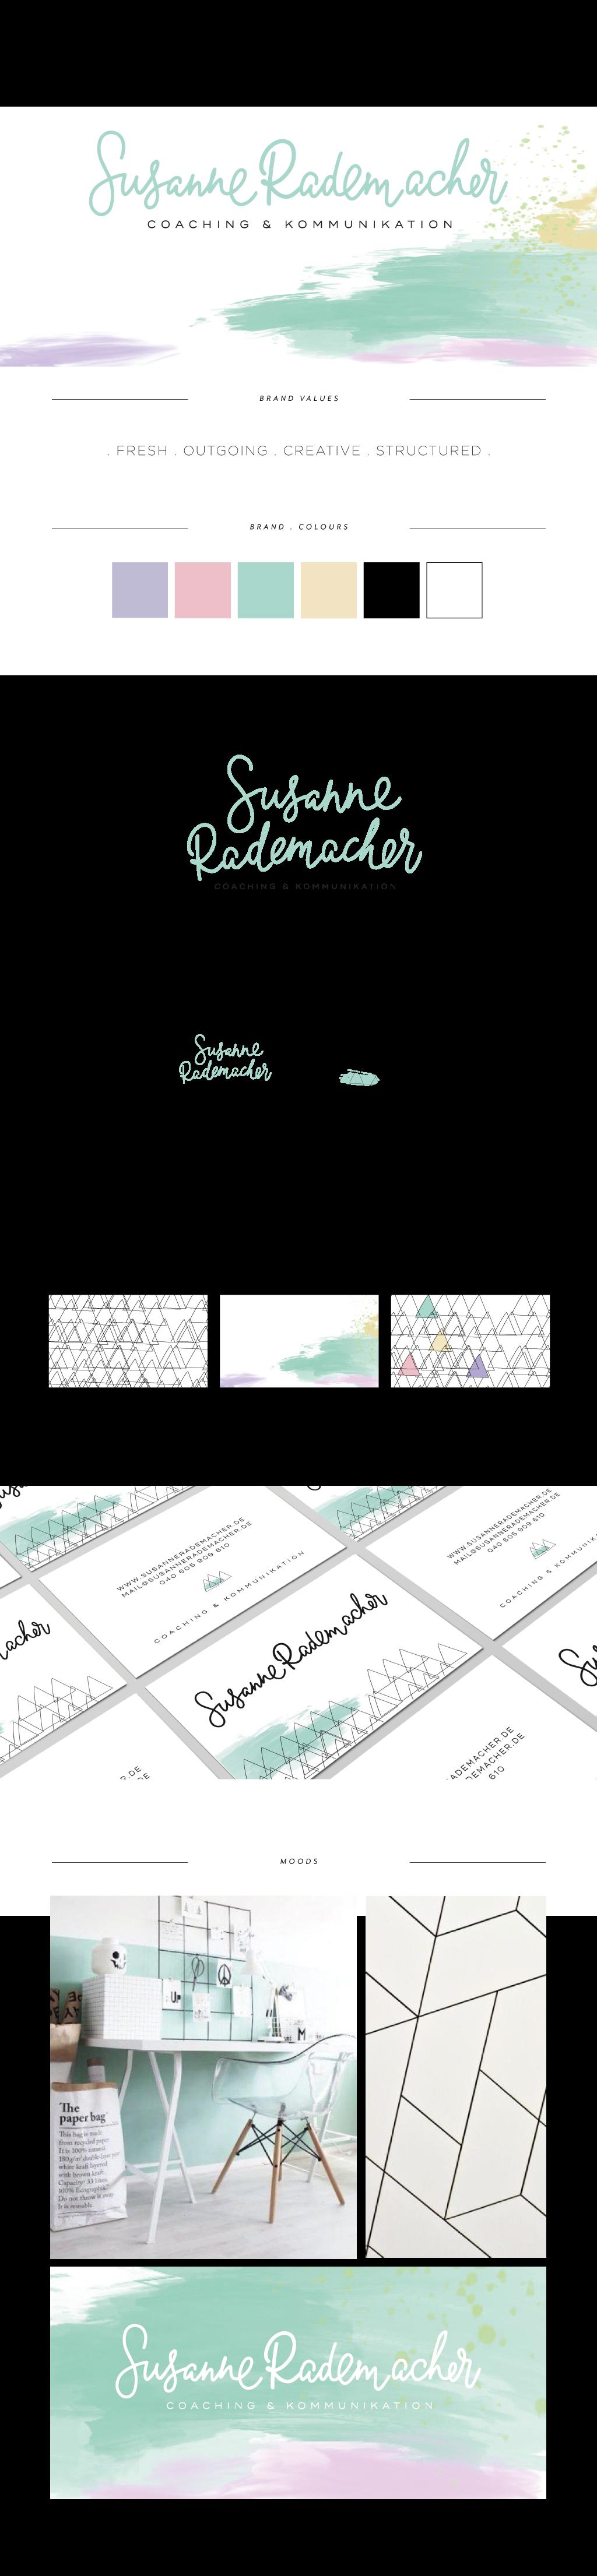 Logo Design And Branding For Susanne Rademacher Coaching